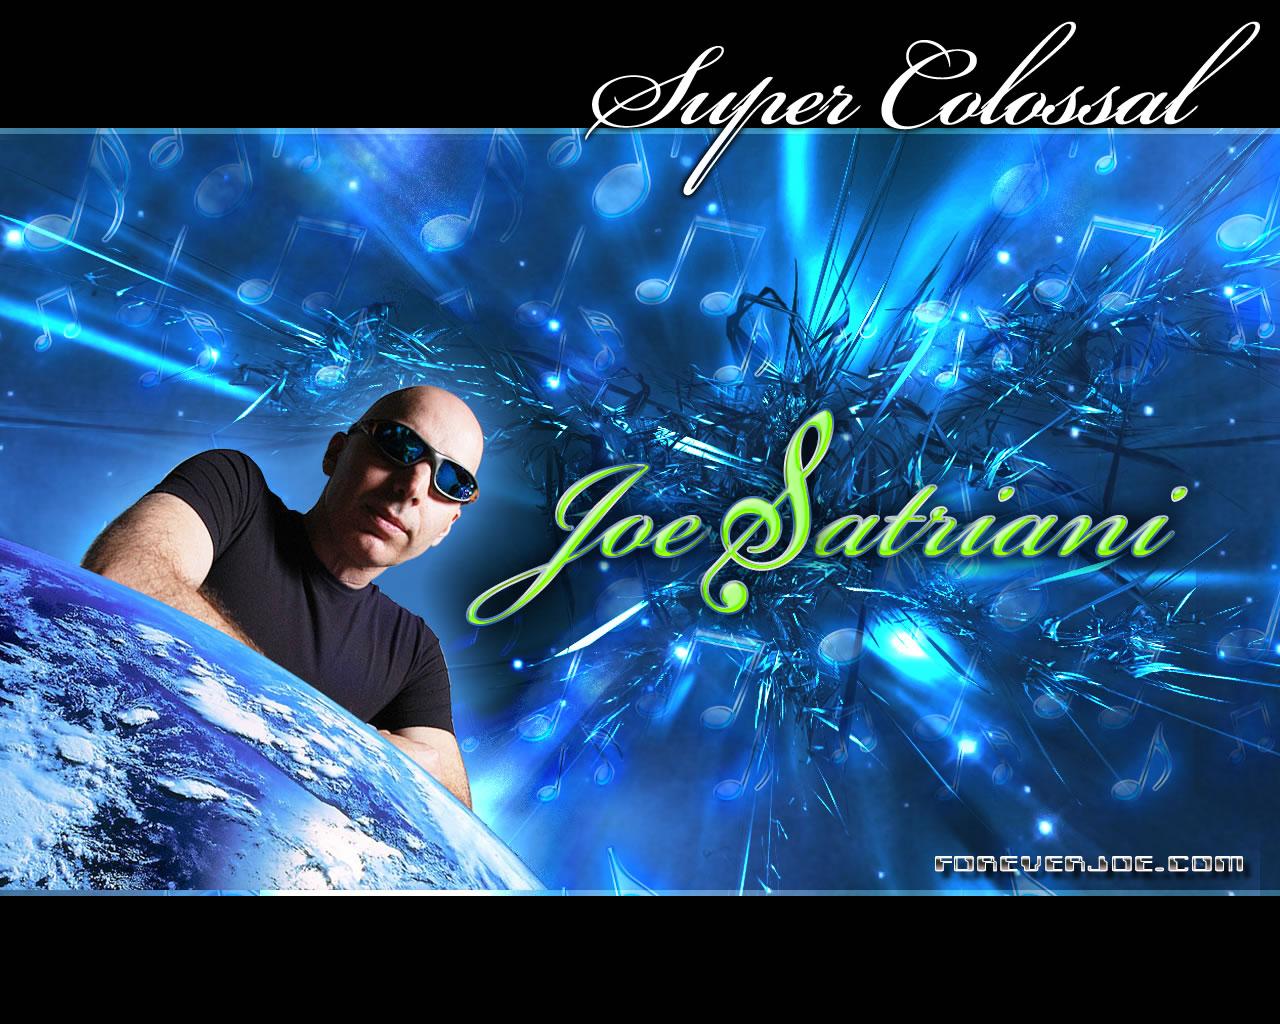 Joe Satriani - Gallery Colection